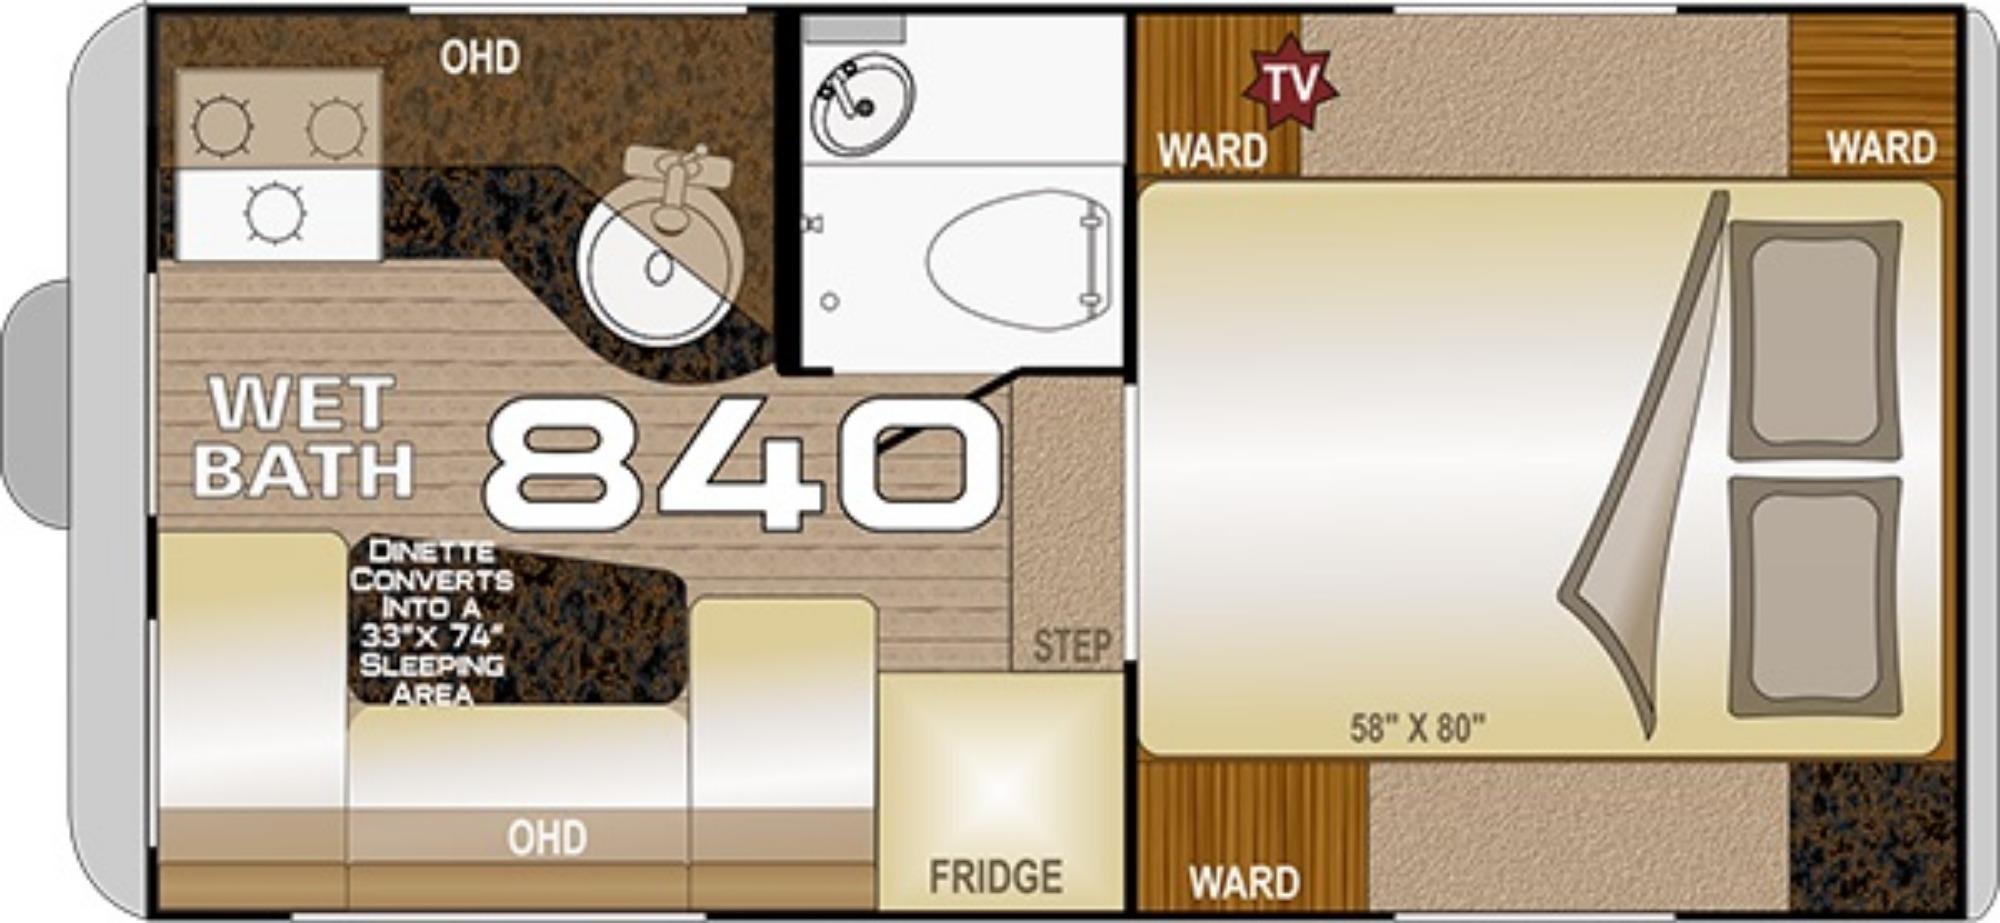 View Floor Plan for 2021 NORTHWOOD WOLF CREEK 840